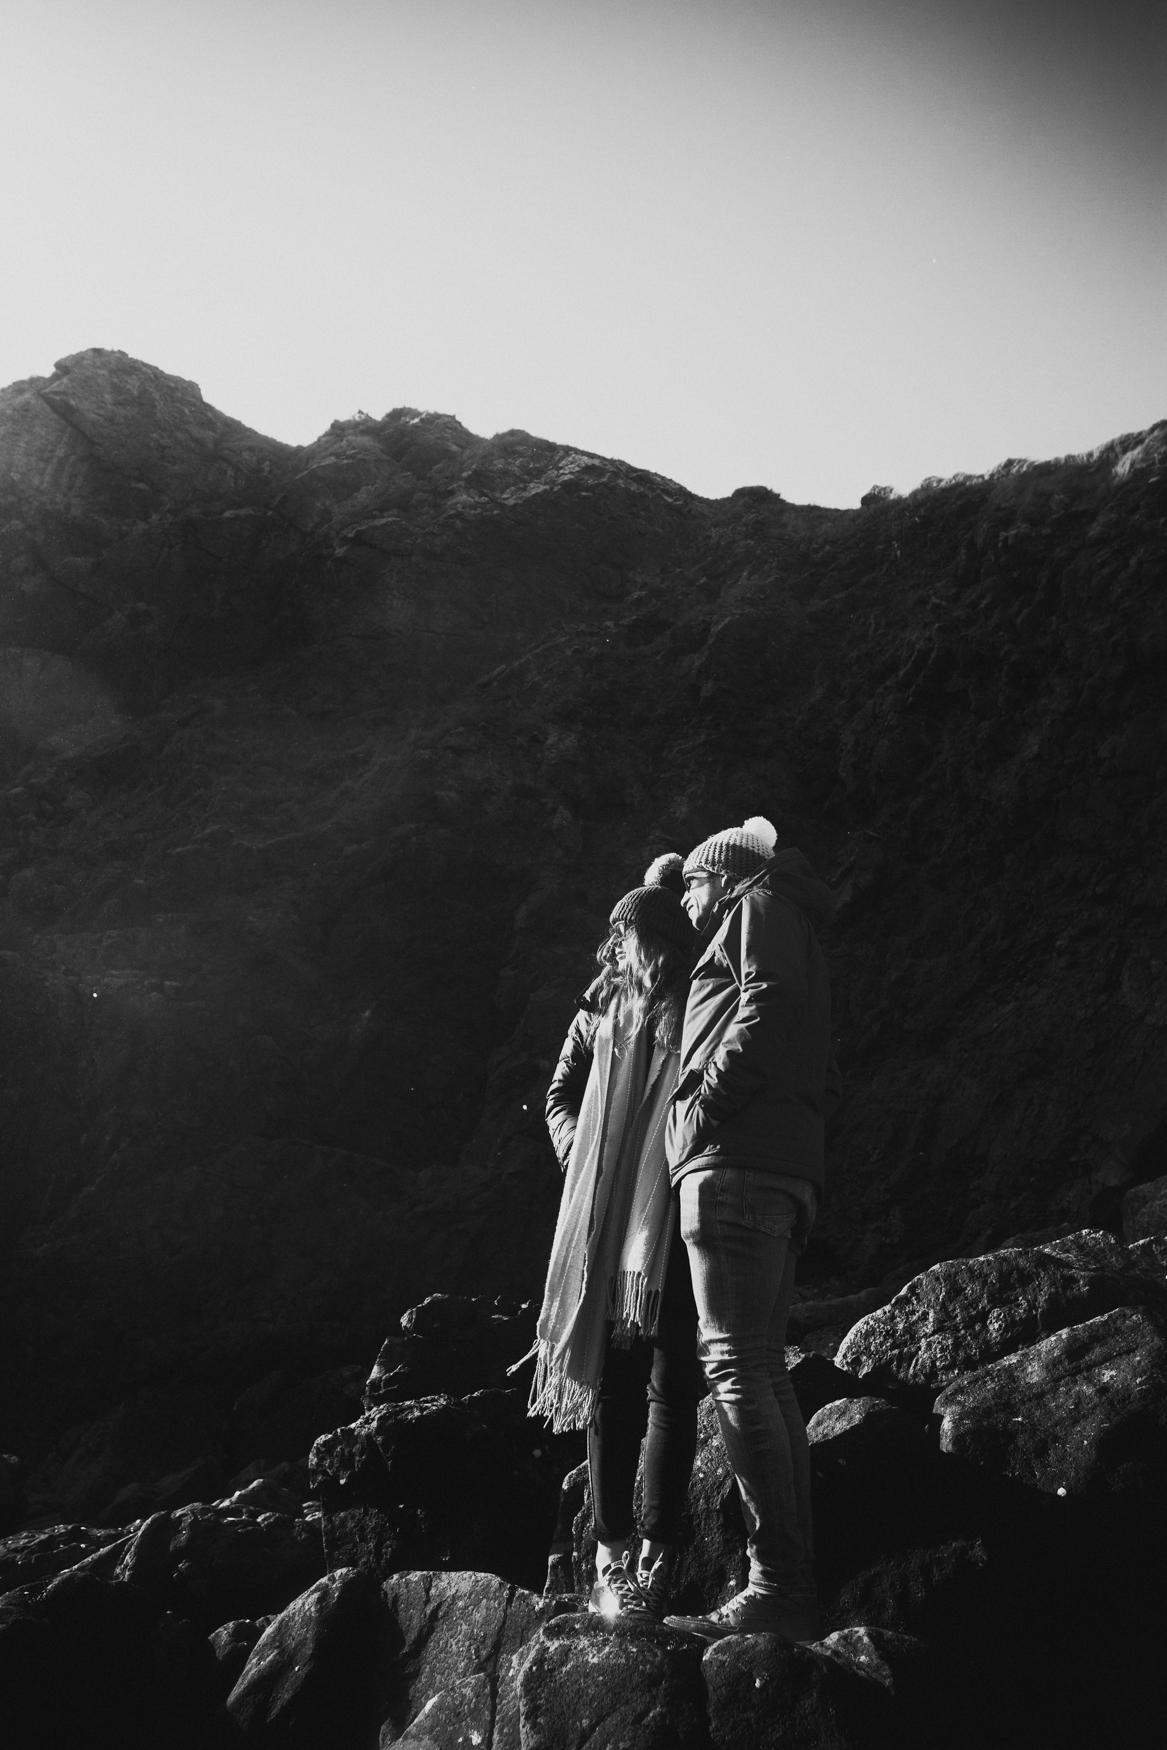 Alex-Sedgmond-Photography-Cardiff-Prewedding-Photography-Castlemartin-Pembrokeshire-WestWales-36.JPG